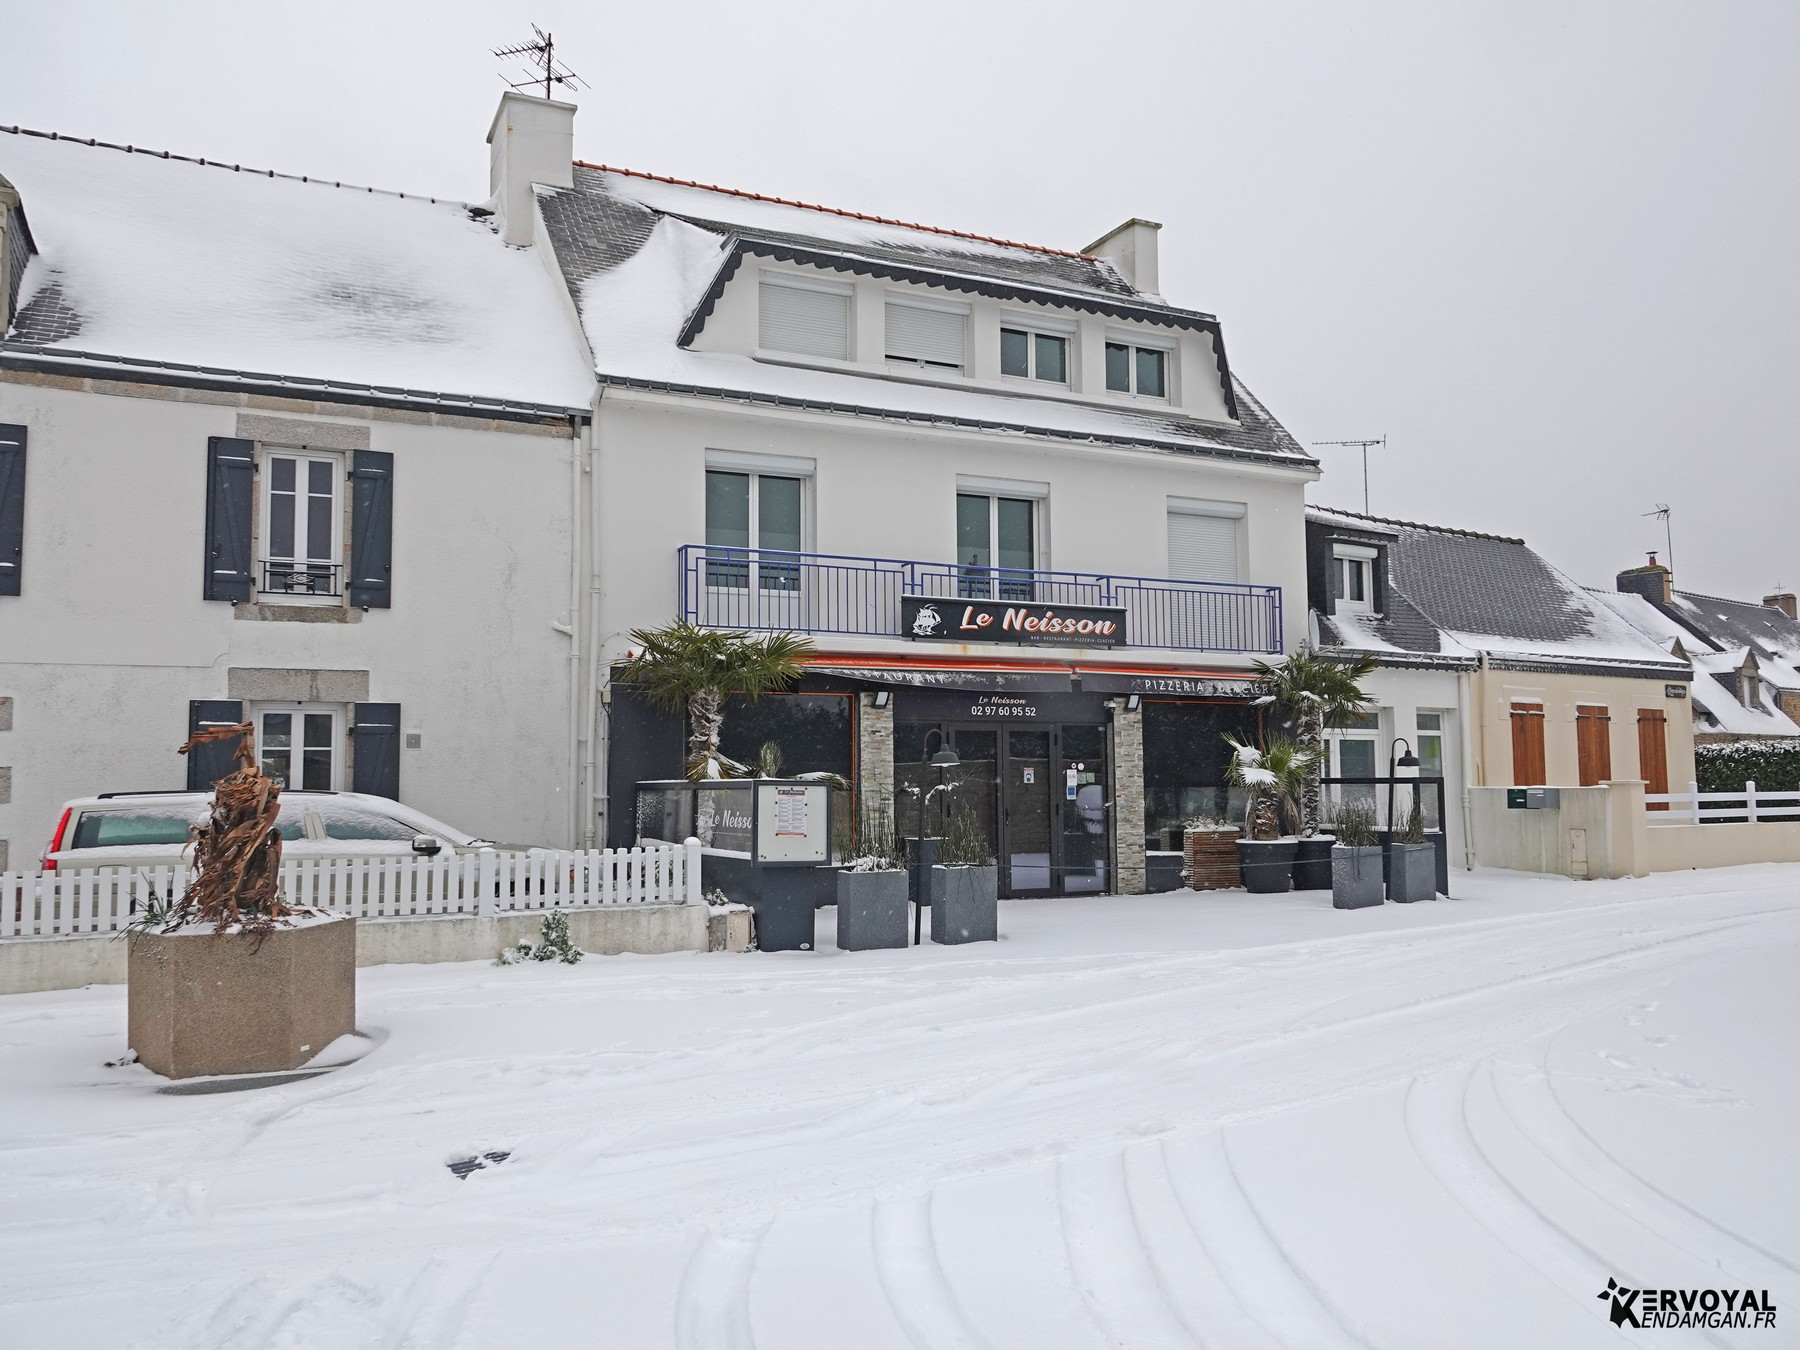 neige à kervoyal 11 février 2021 damgan morbihan (14)